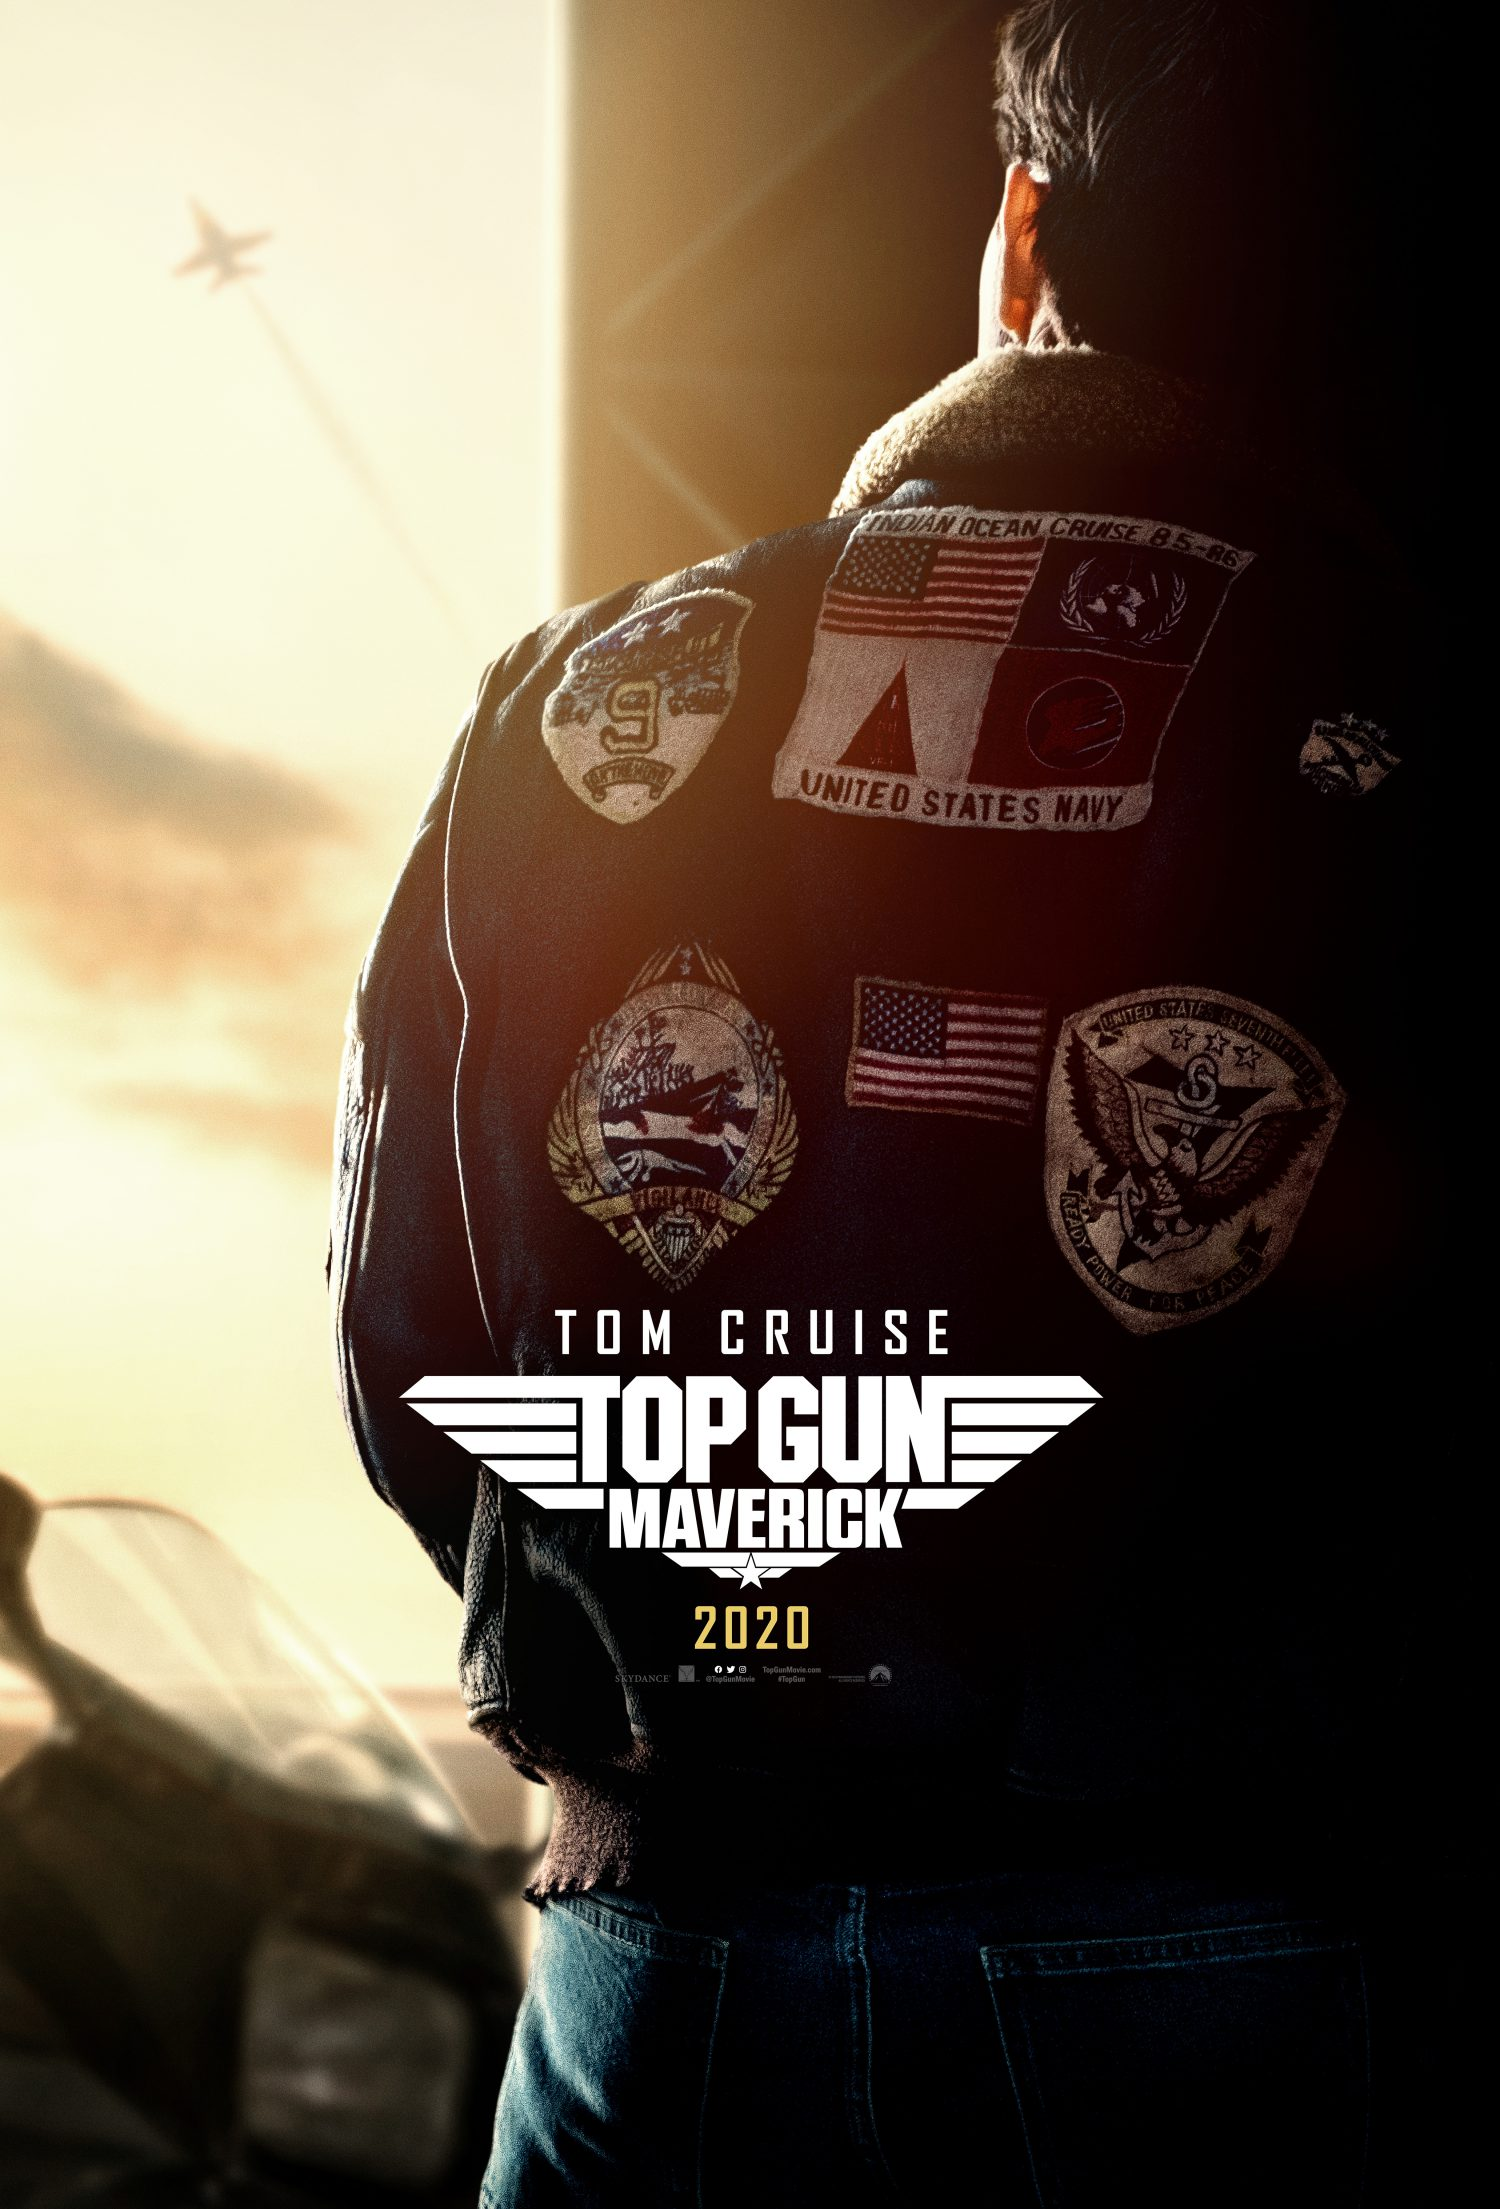 Tom Cruise is back as Maverick in Top Gun: Maverick.